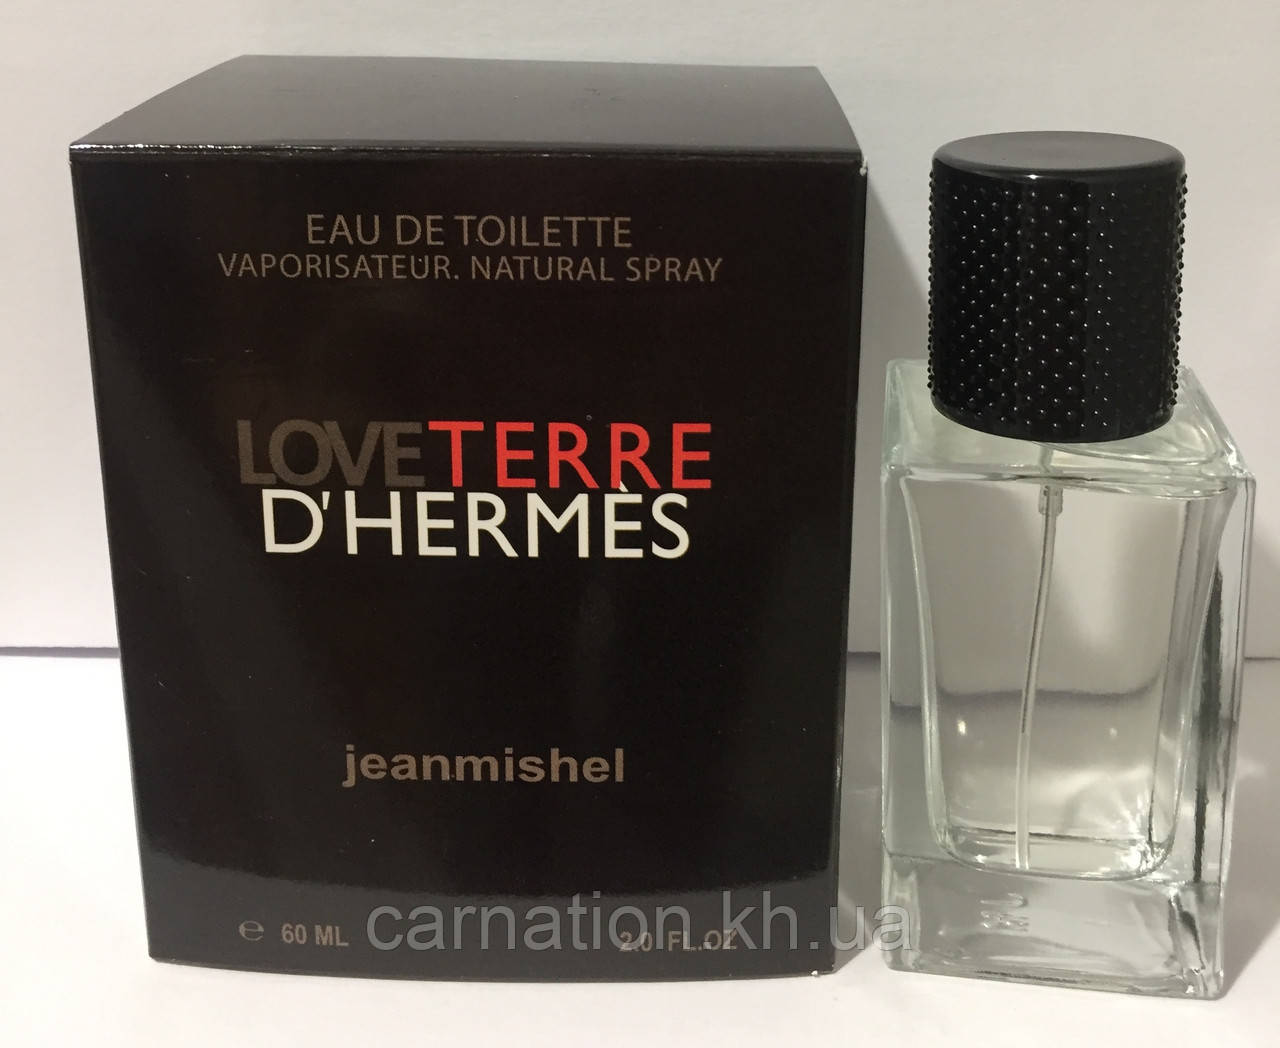 Мужской парфюм Jeanmishel LoveTerre d'Hermes 60 мл